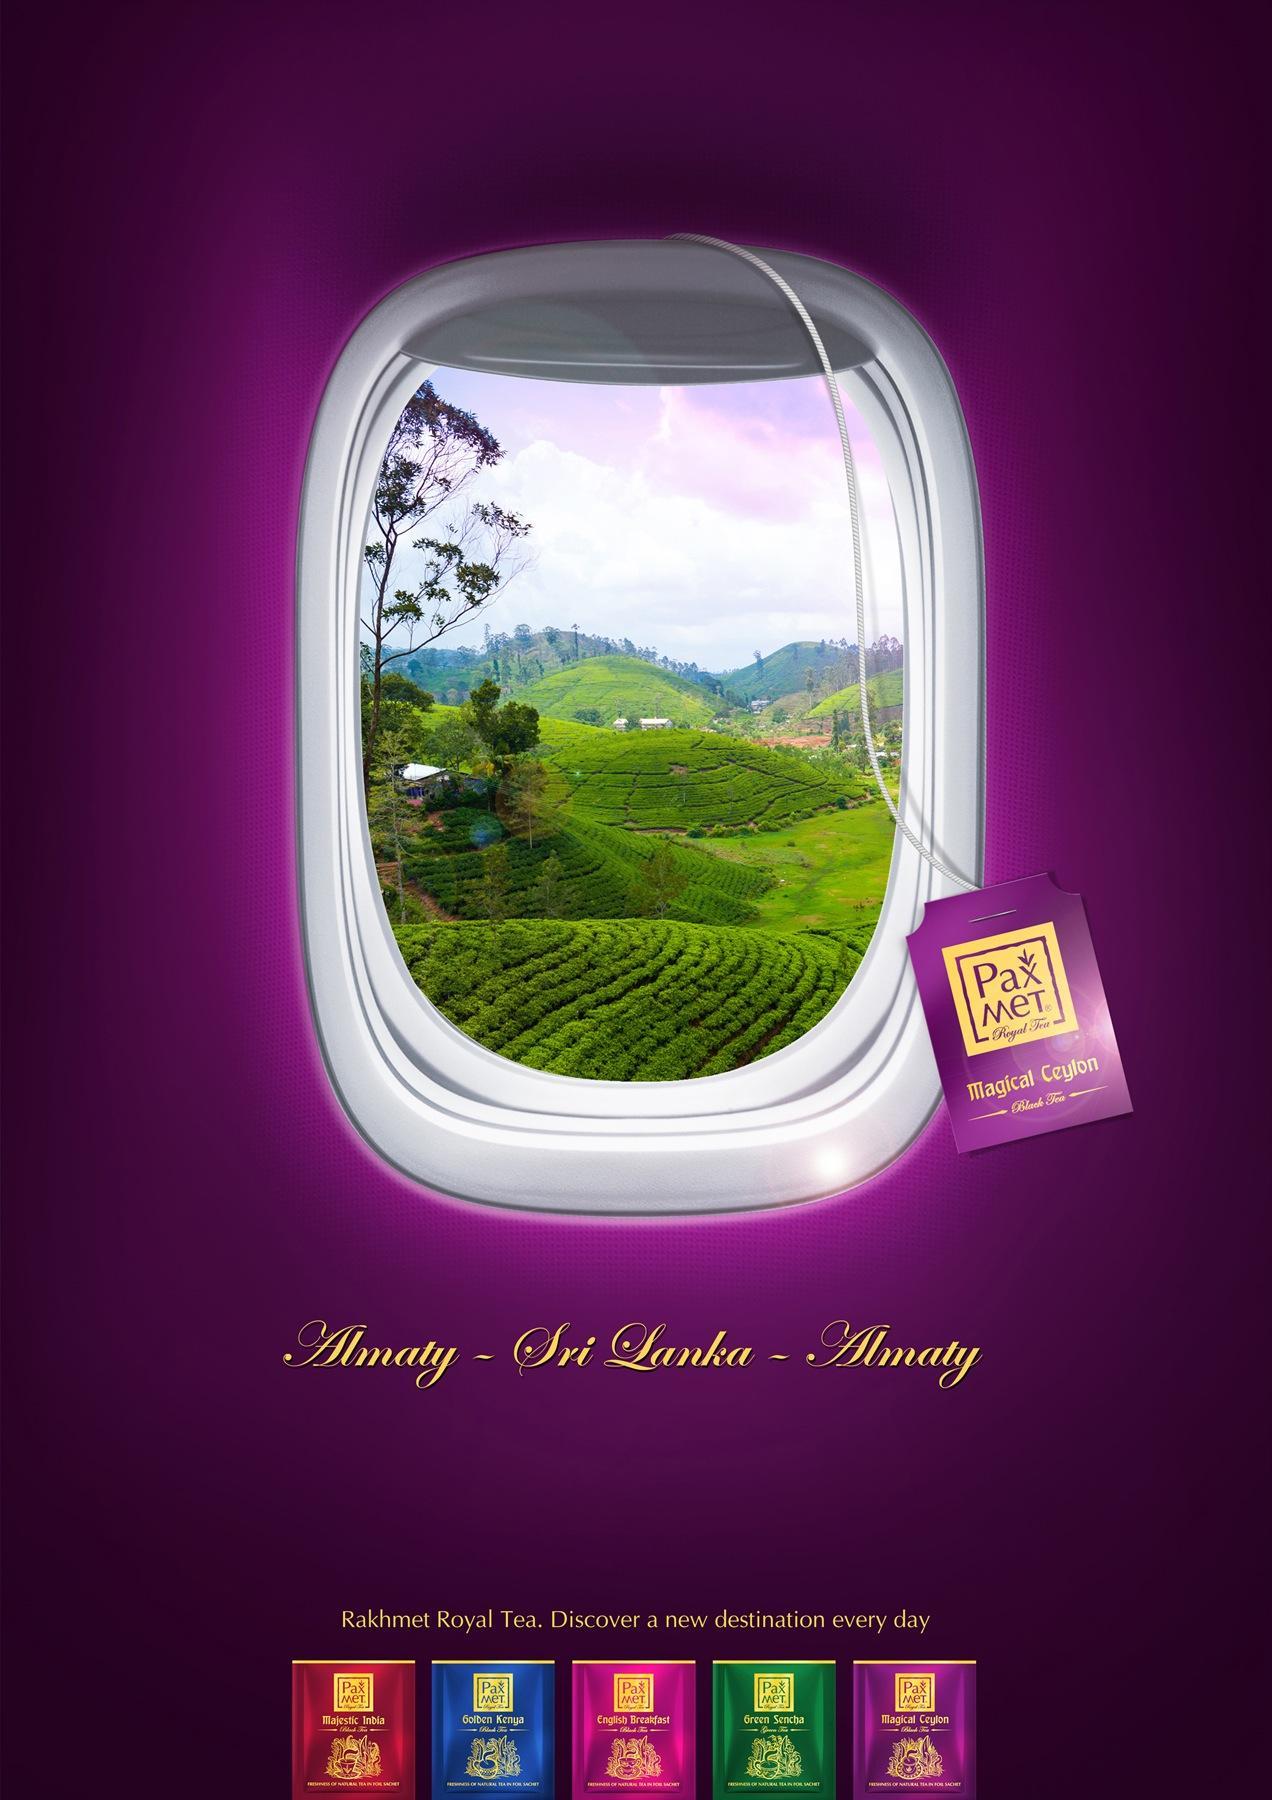 Rakhmet Royal Tea Outdoor Ad -  Des-tea-nations, 5